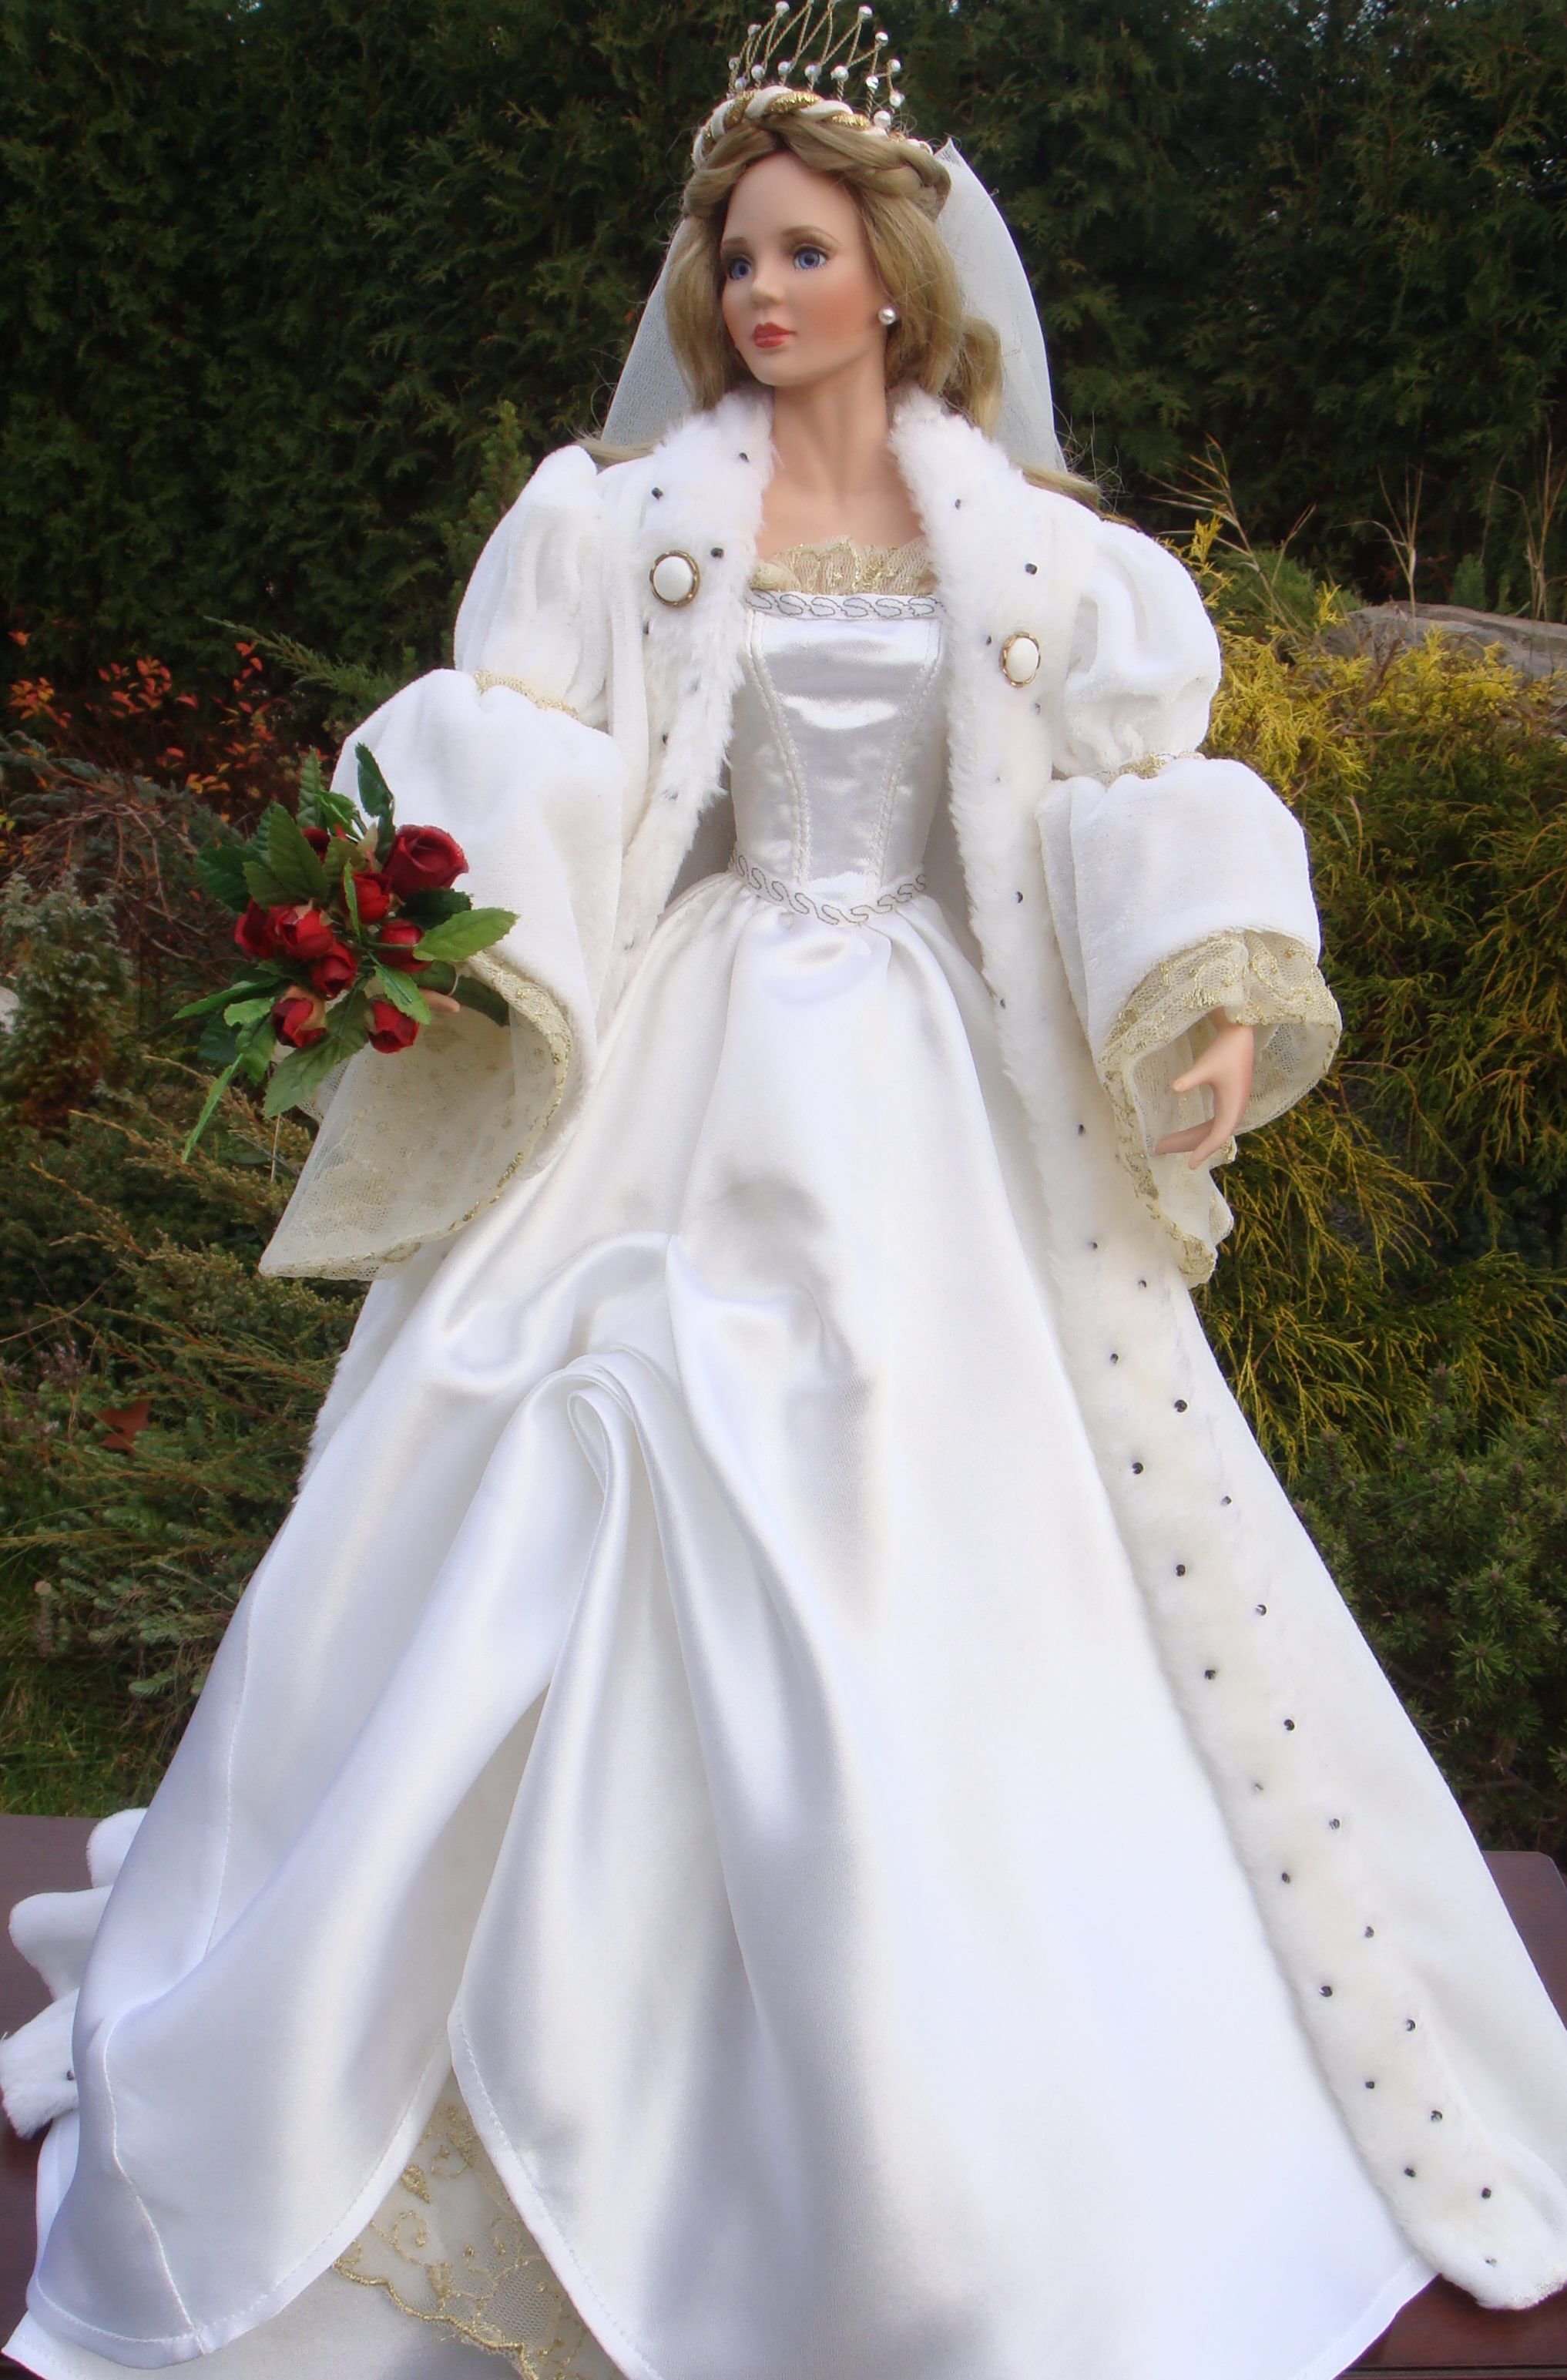 Doll wedding dress  Sleeping Beauty Bride  Cindy McClure  AshtonDrake Galleries